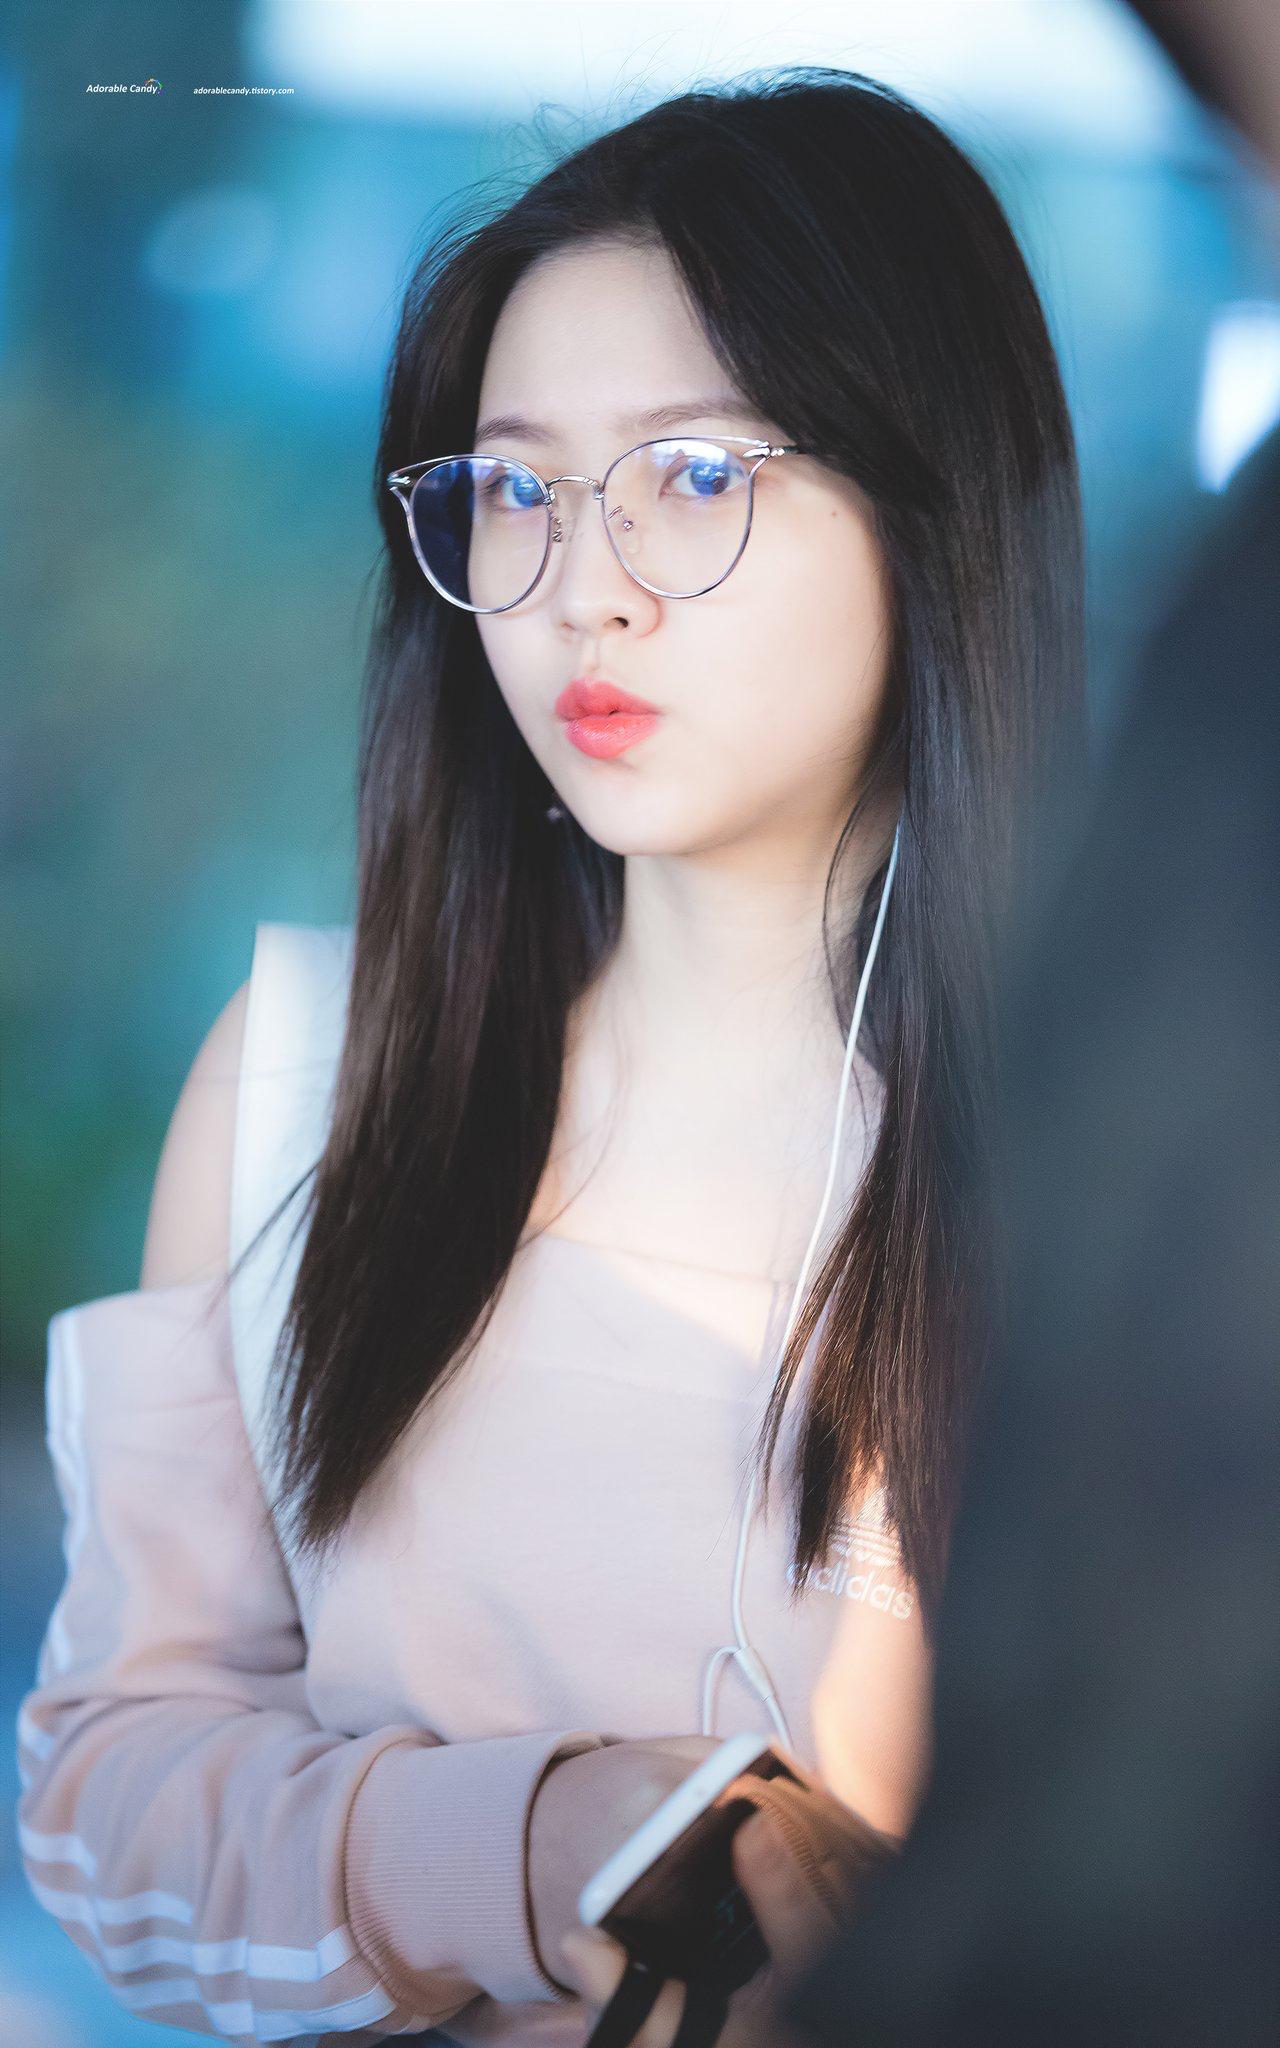 1d93f84c4e1 I want Yeri s glasses Seulgi